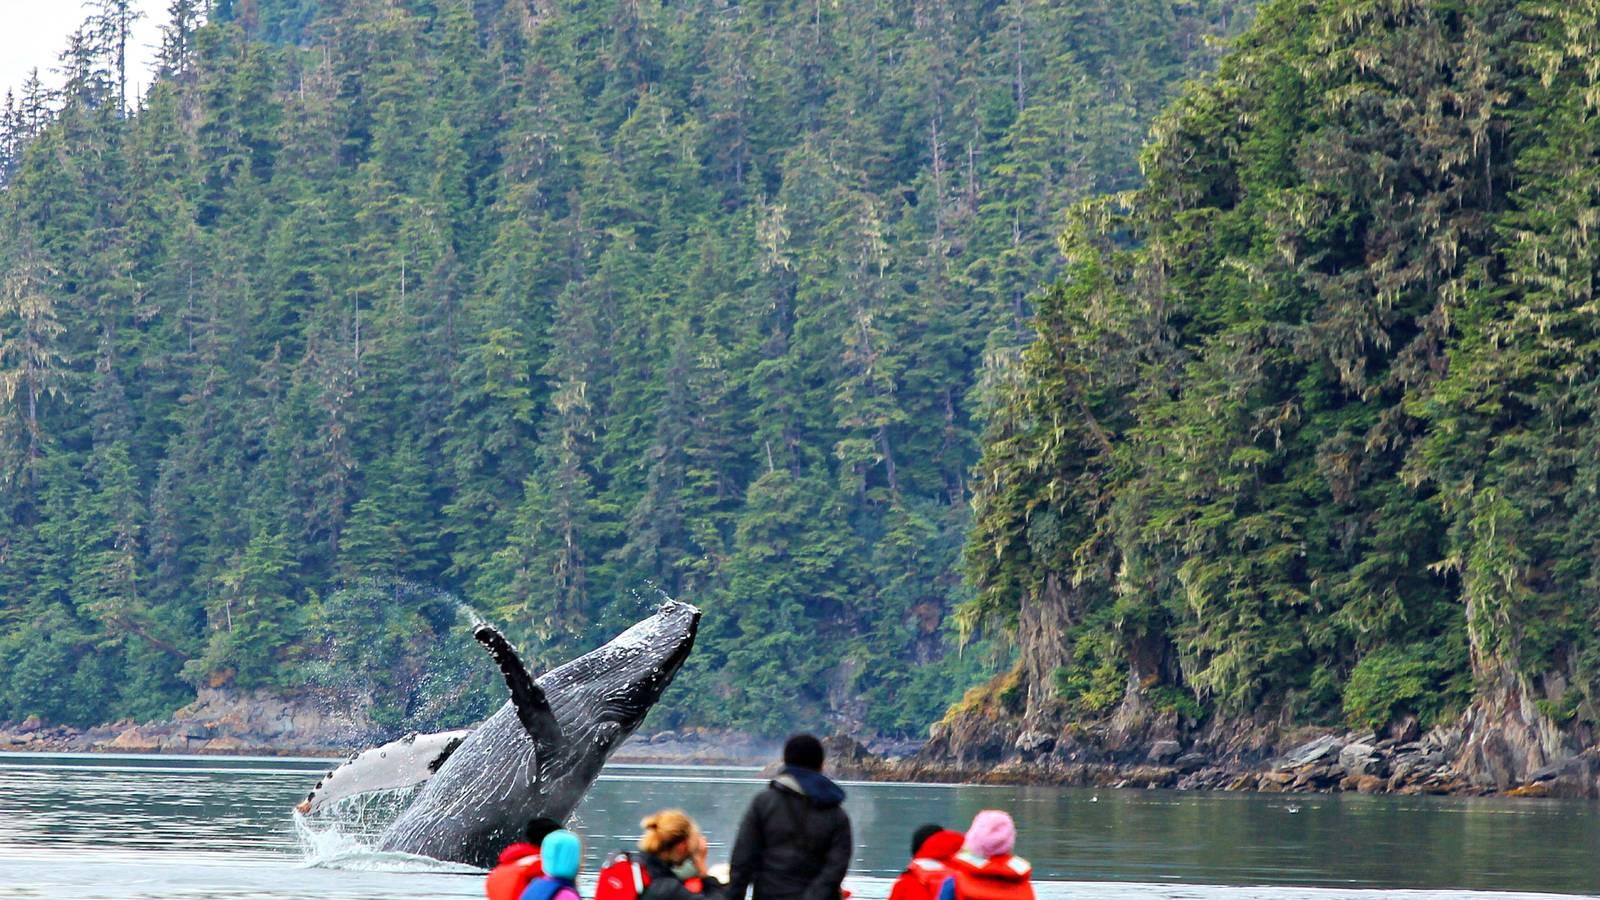 Fjords Of Alaska Cruise Ultimate Expedition 183 National Parks Conservation Association